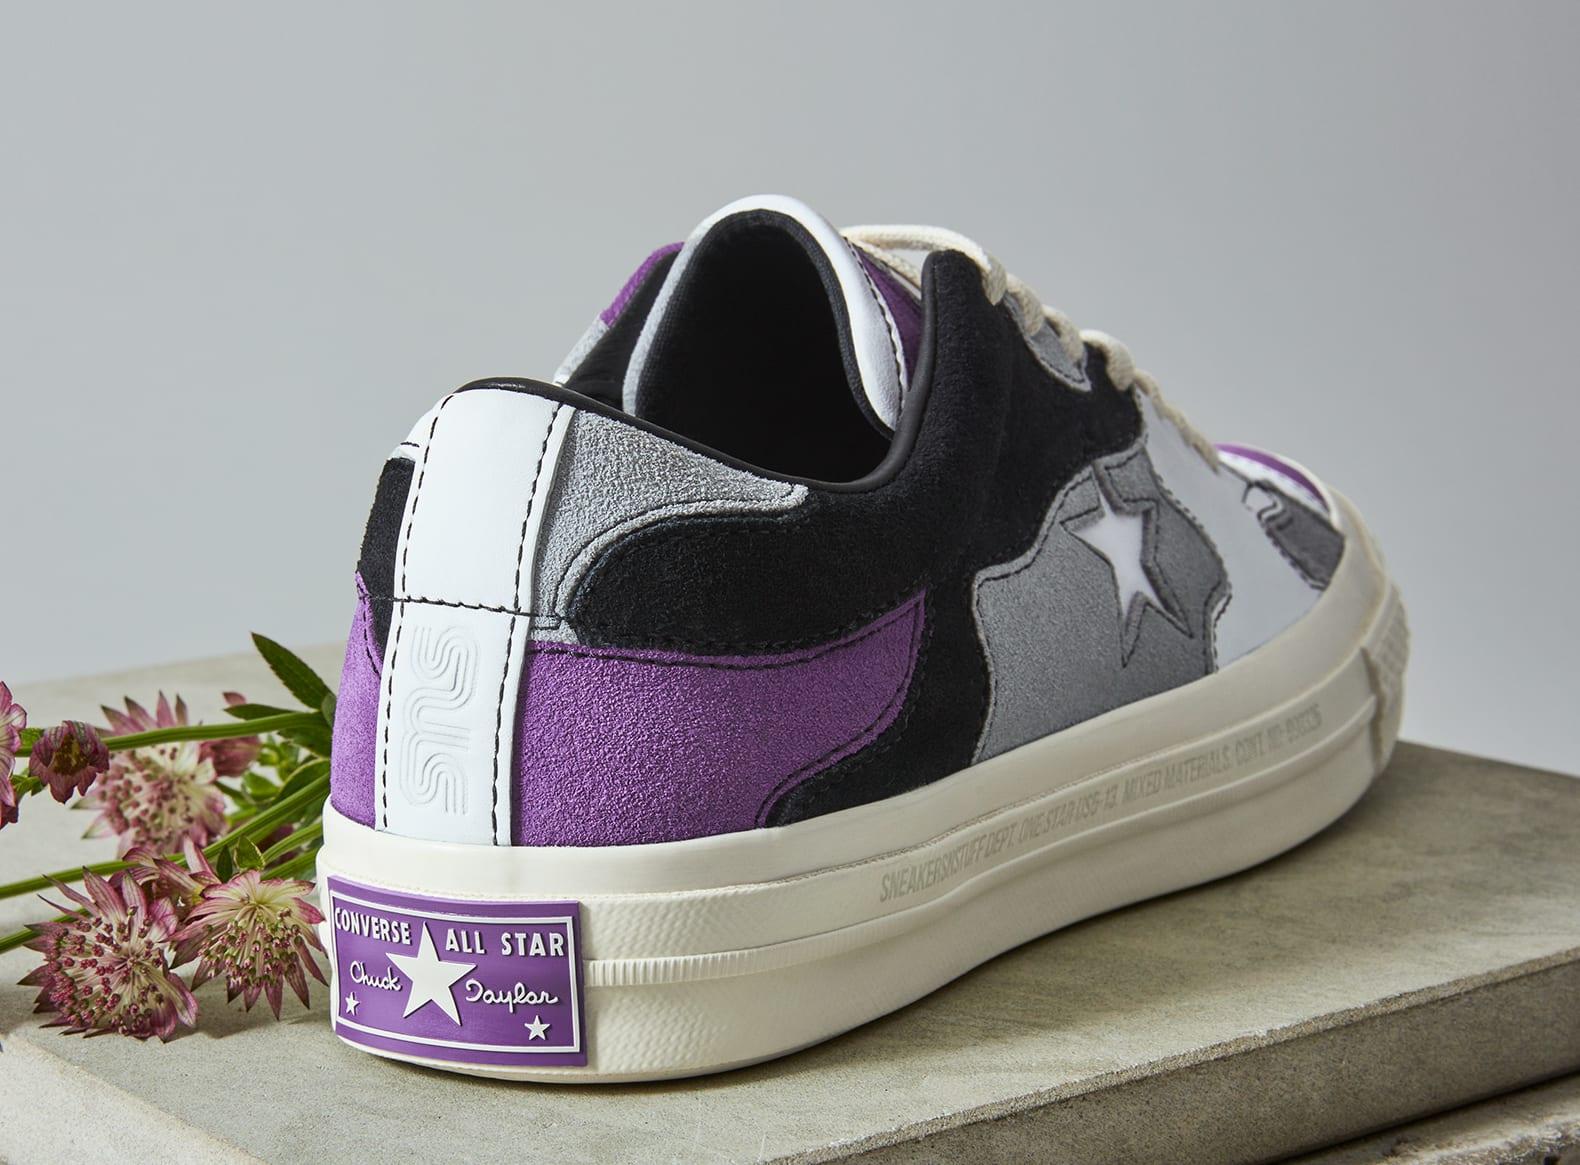 Sneakersnstuff x Converse One Star 'Deep Lavender' (Heel)